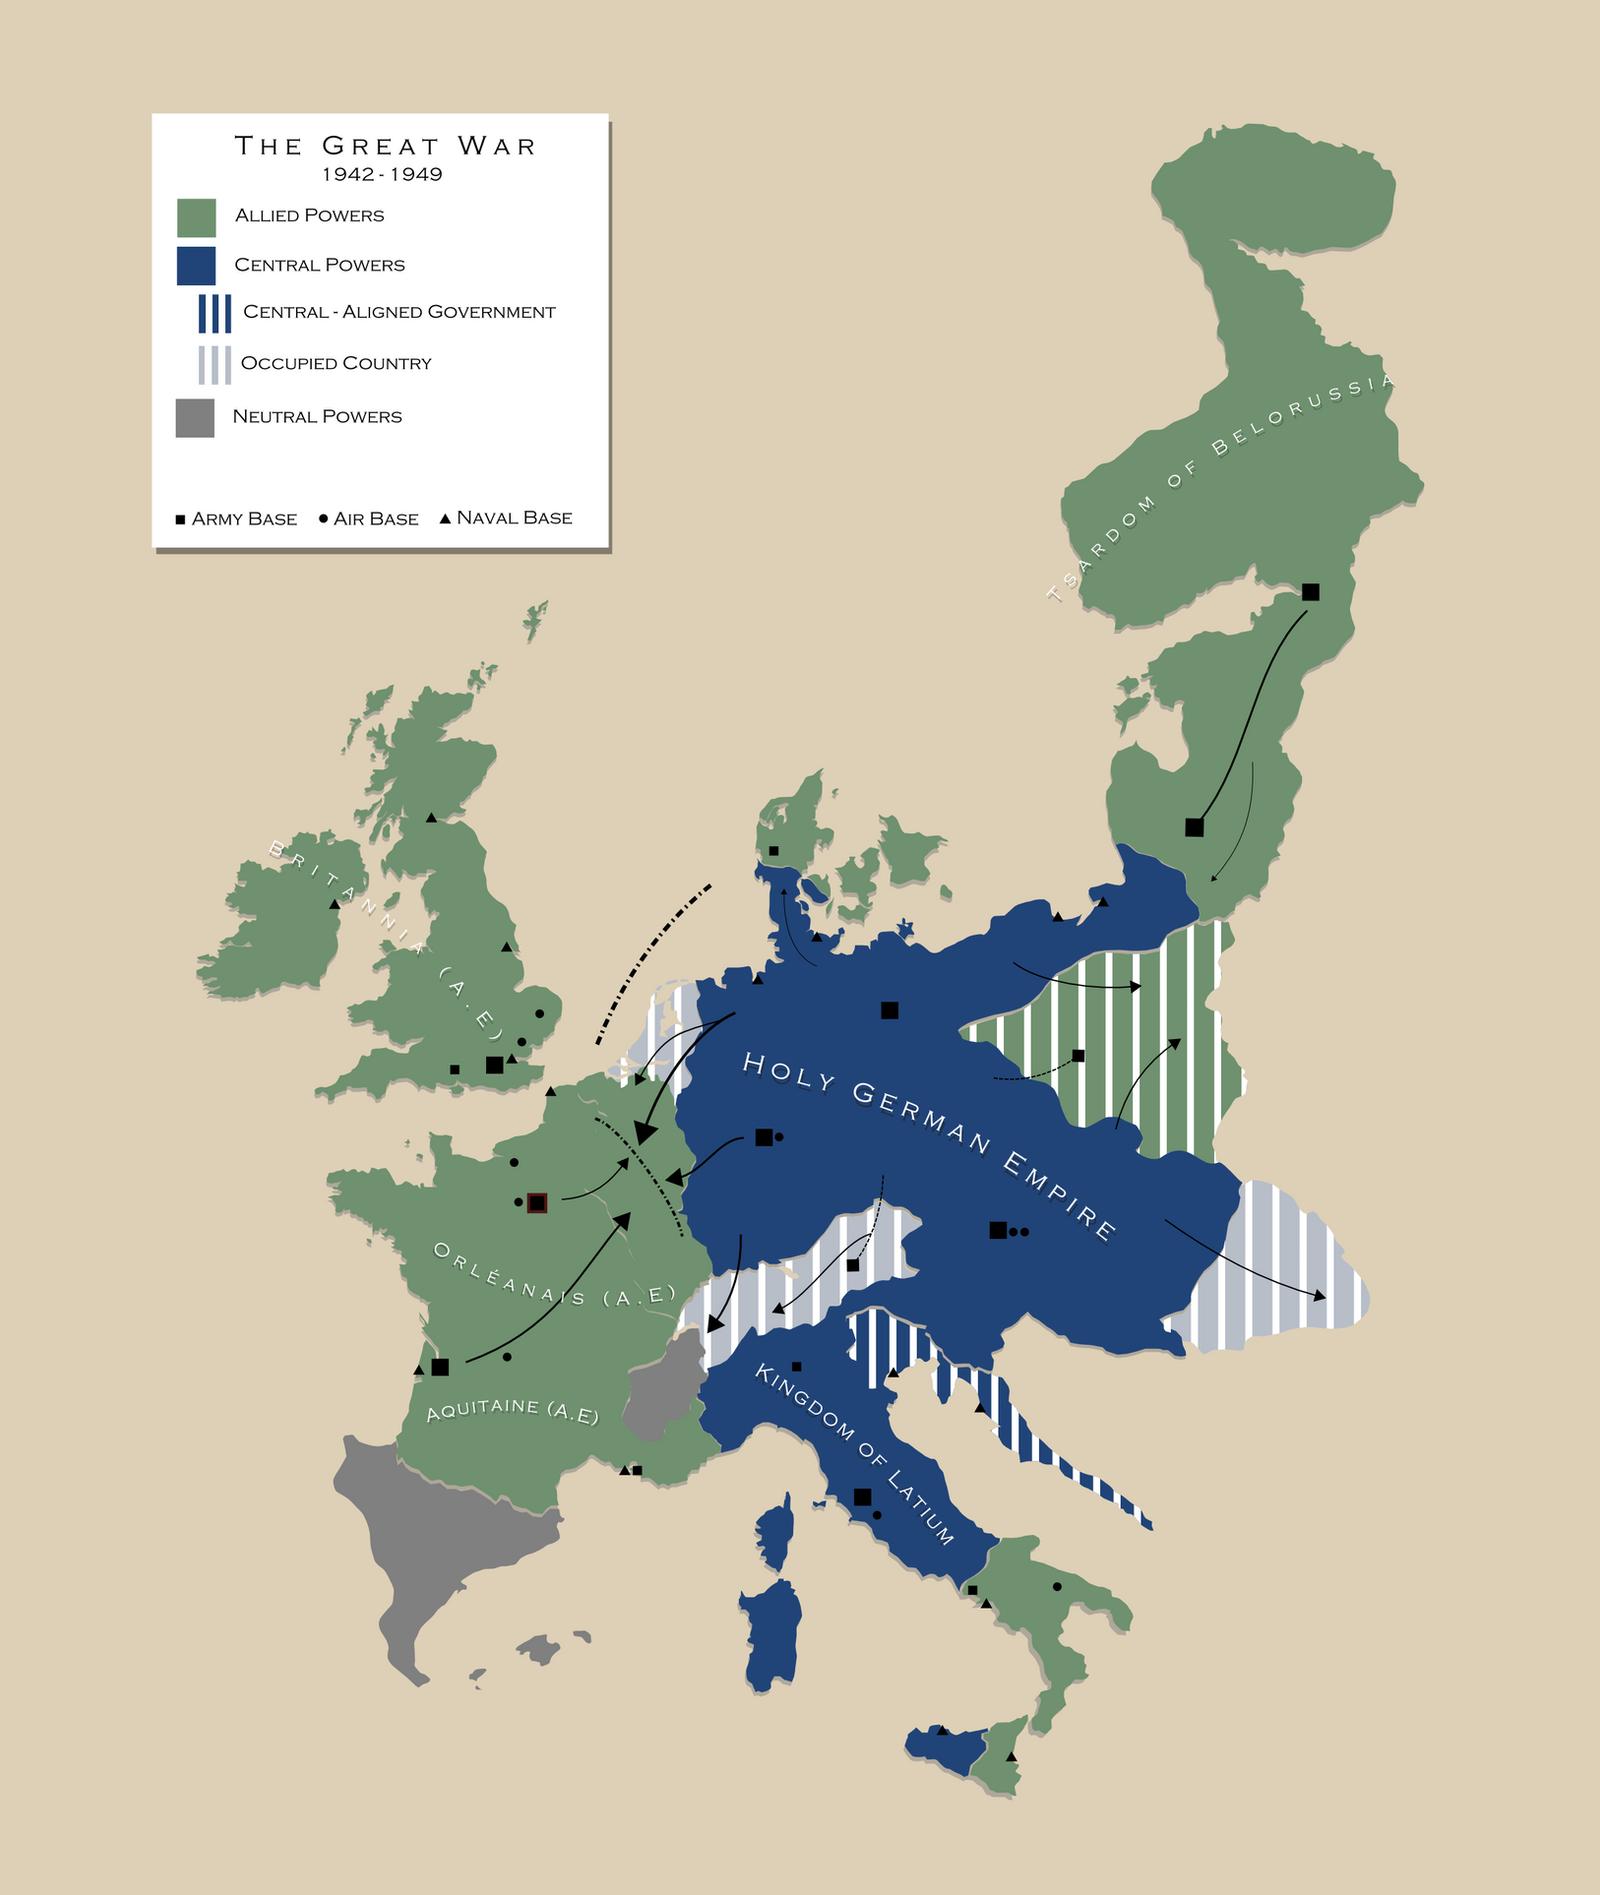 AH The Great War: Mid-1943 by Maonsie